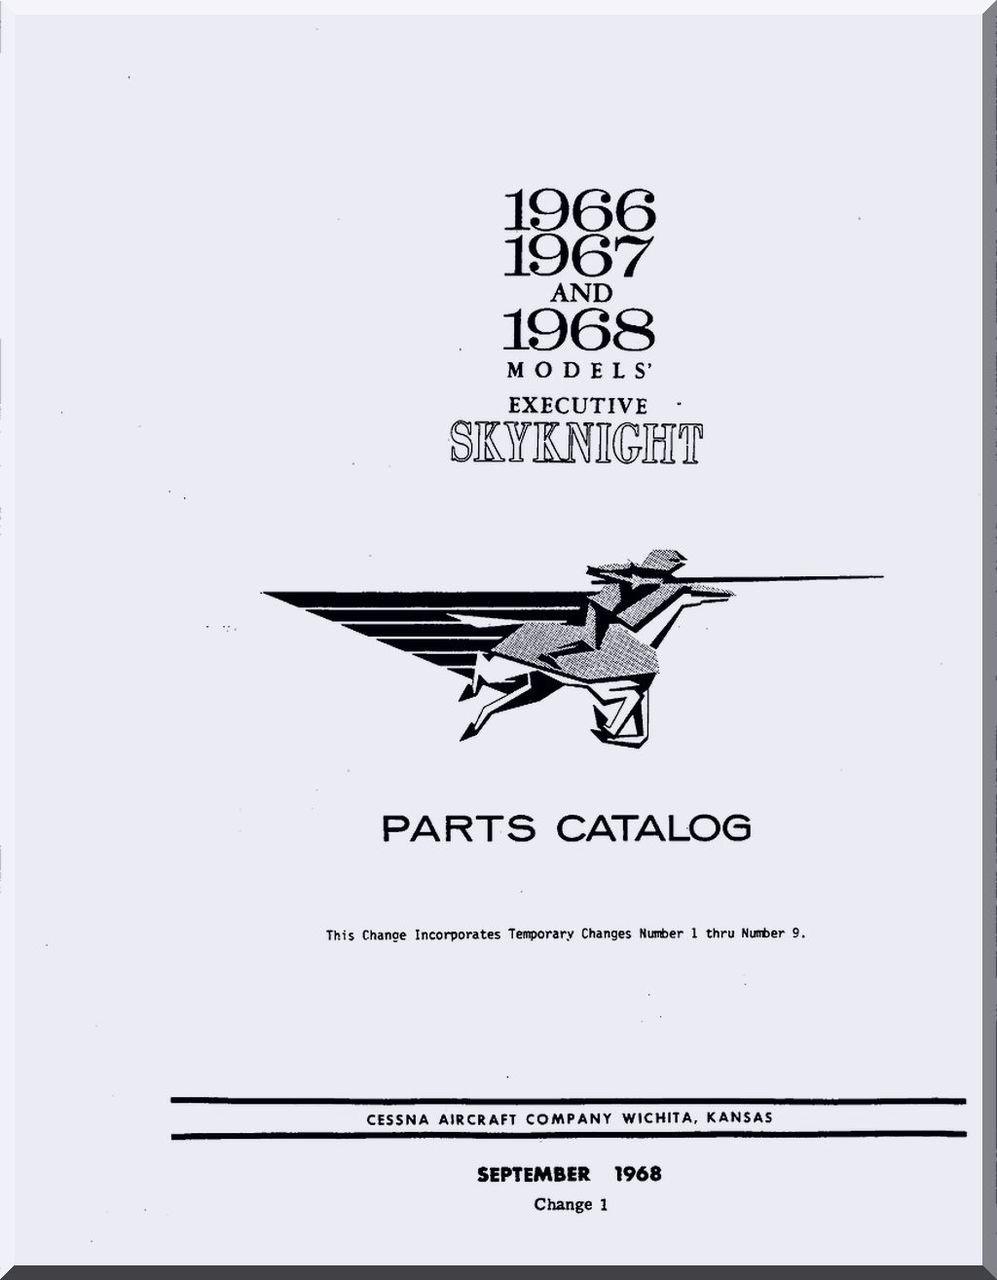 Cessna Skynight Aircraft Illustrated Parts Catalog Manual